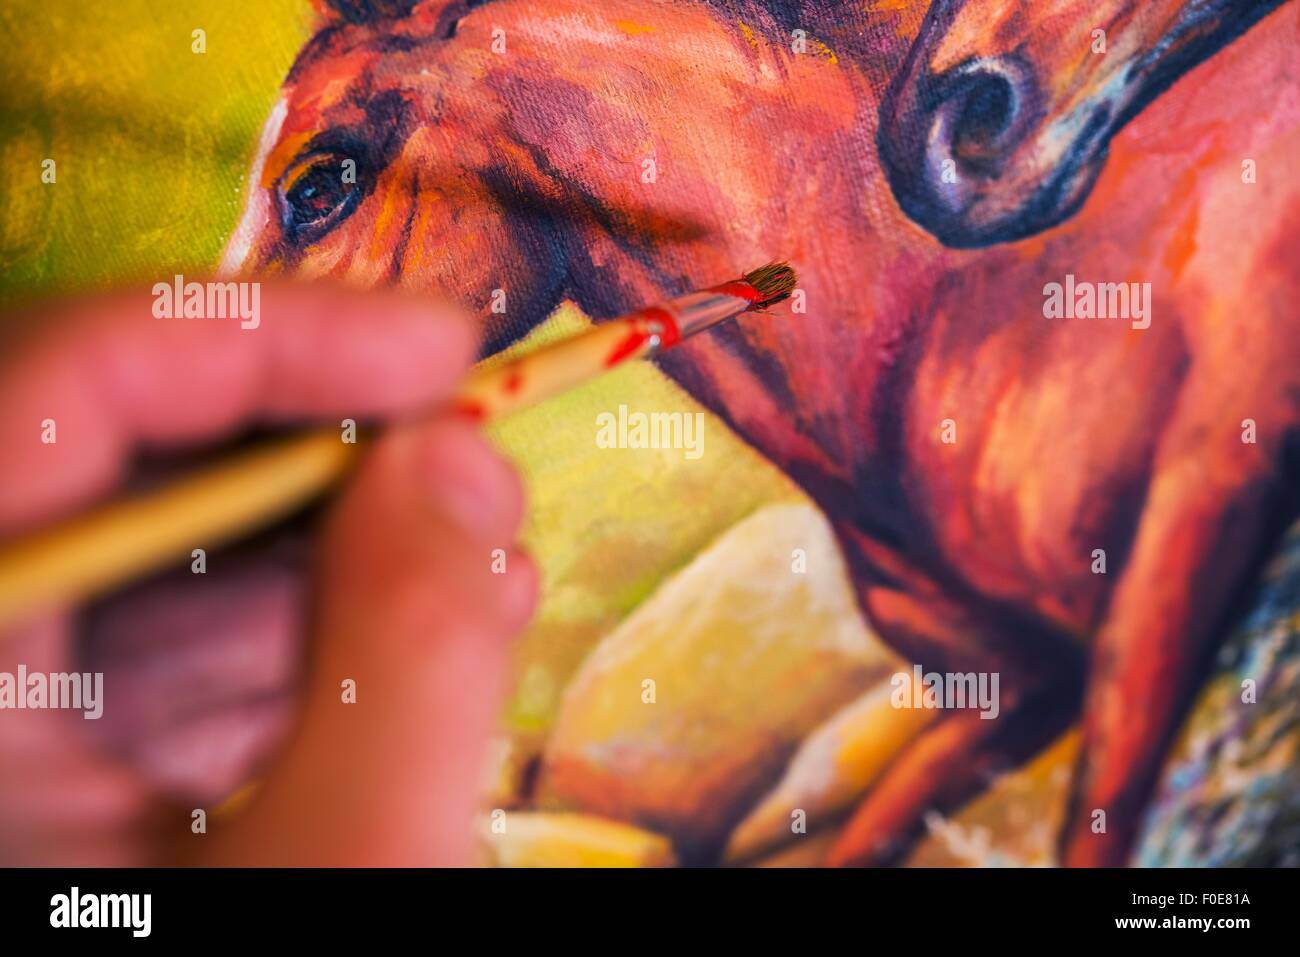 Malerei auf Leinwand. Pferde Ölgemälde Closeup Foto. Stockfoto